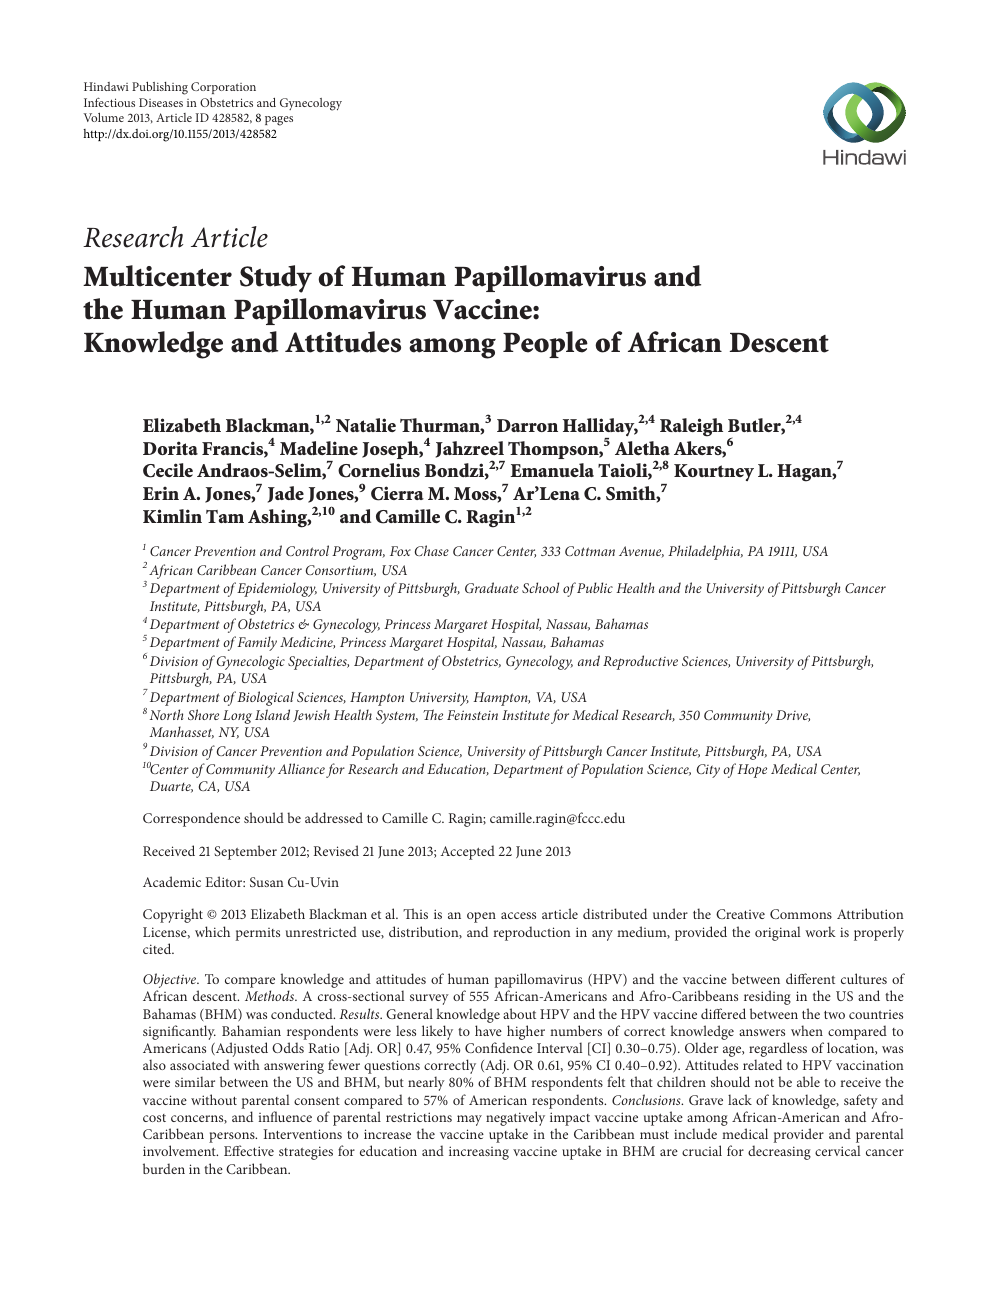 Human papillomavirus feet. hhh | Cervical Cancer | Oral Sex, Human papillomavirus warts on feet